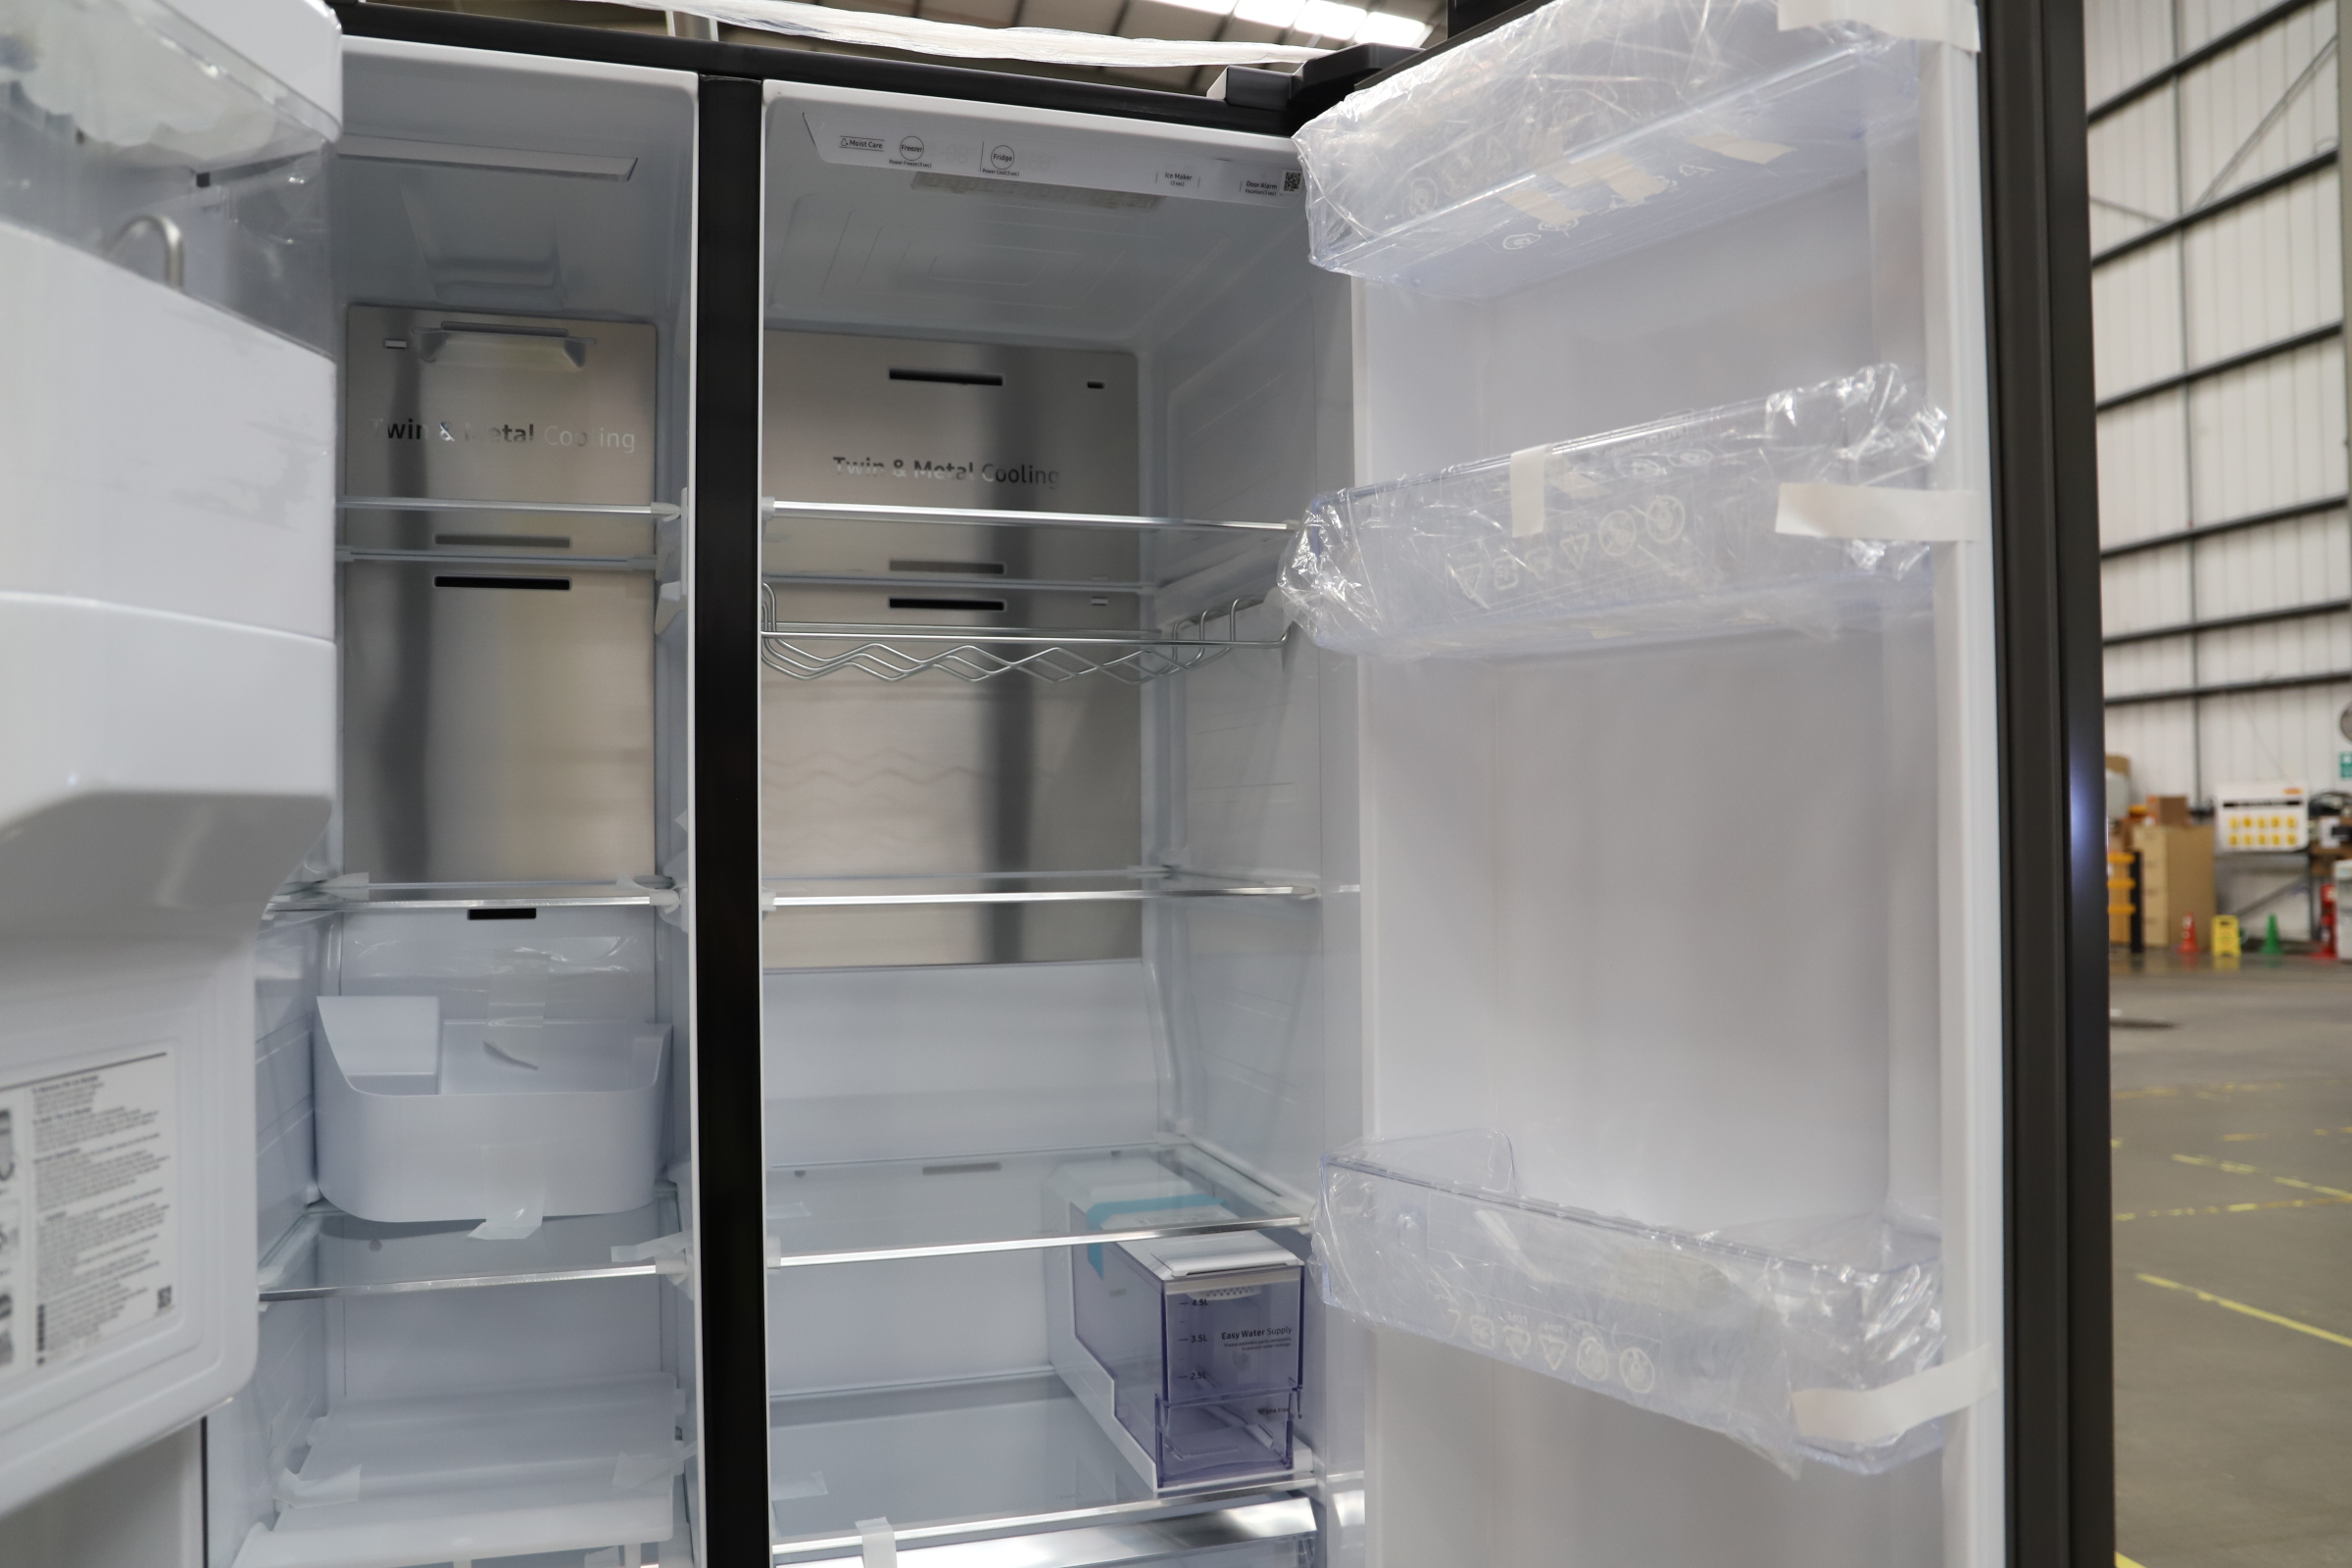 Pallet of 1 Samsung Water & Ice Fridge freezer. Latest selling price £1,799.99 - Image 9 of 10